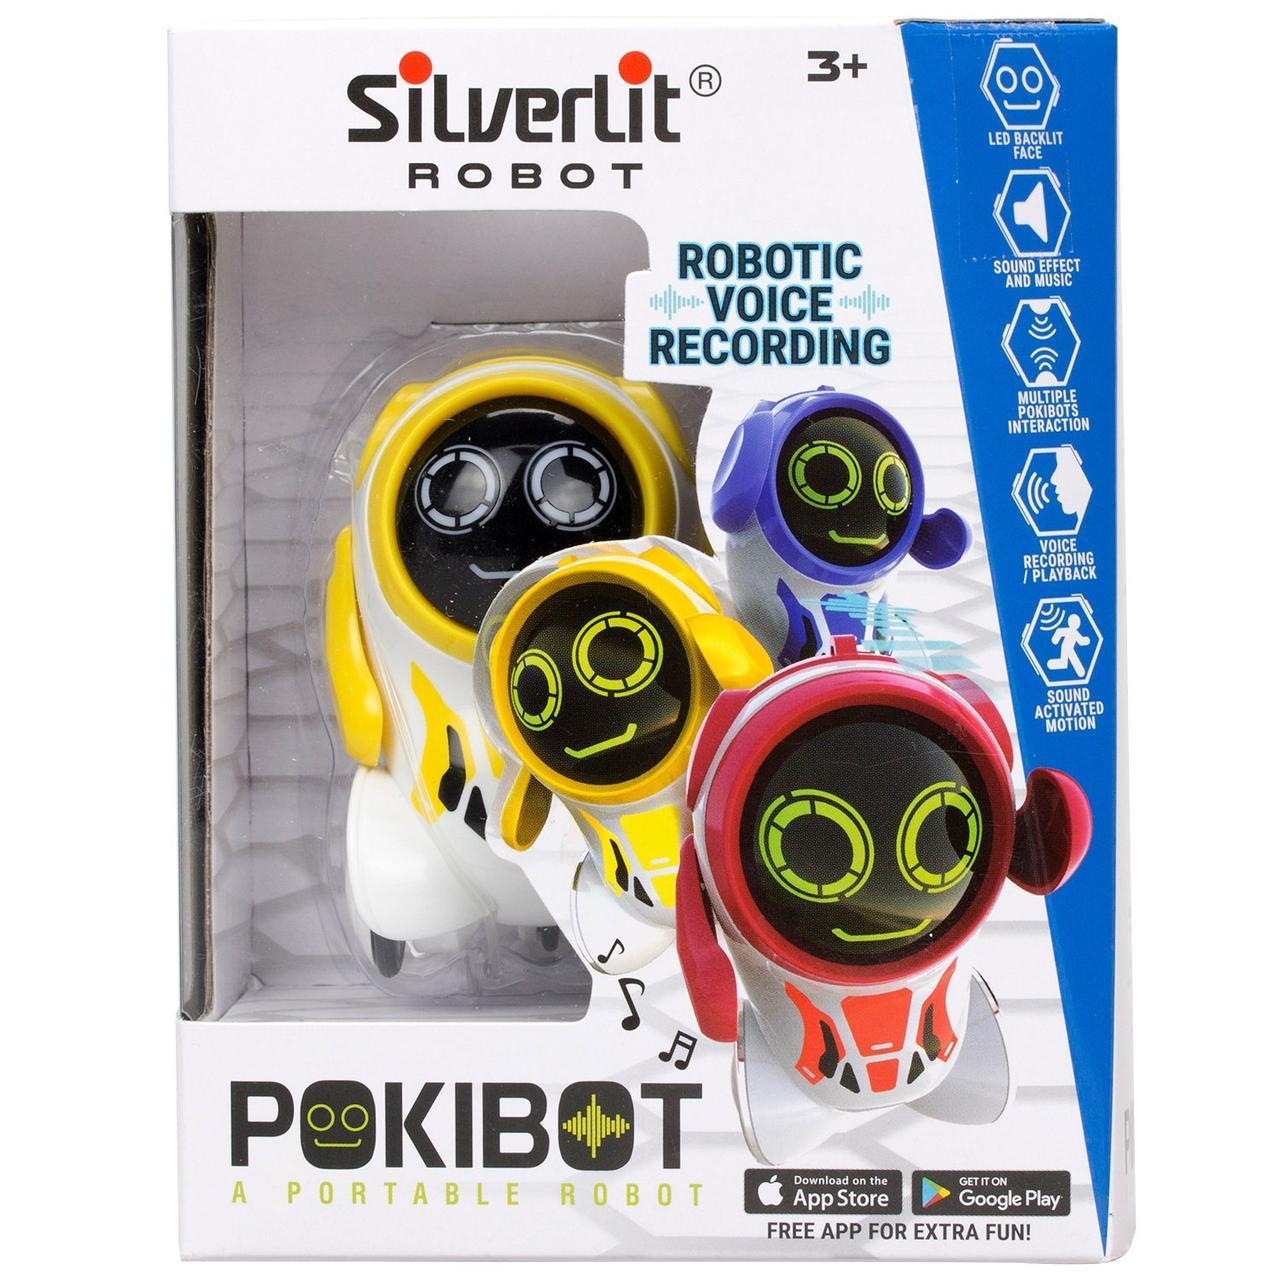 Silverlit Робот Покибот (Pokibot) - желтый